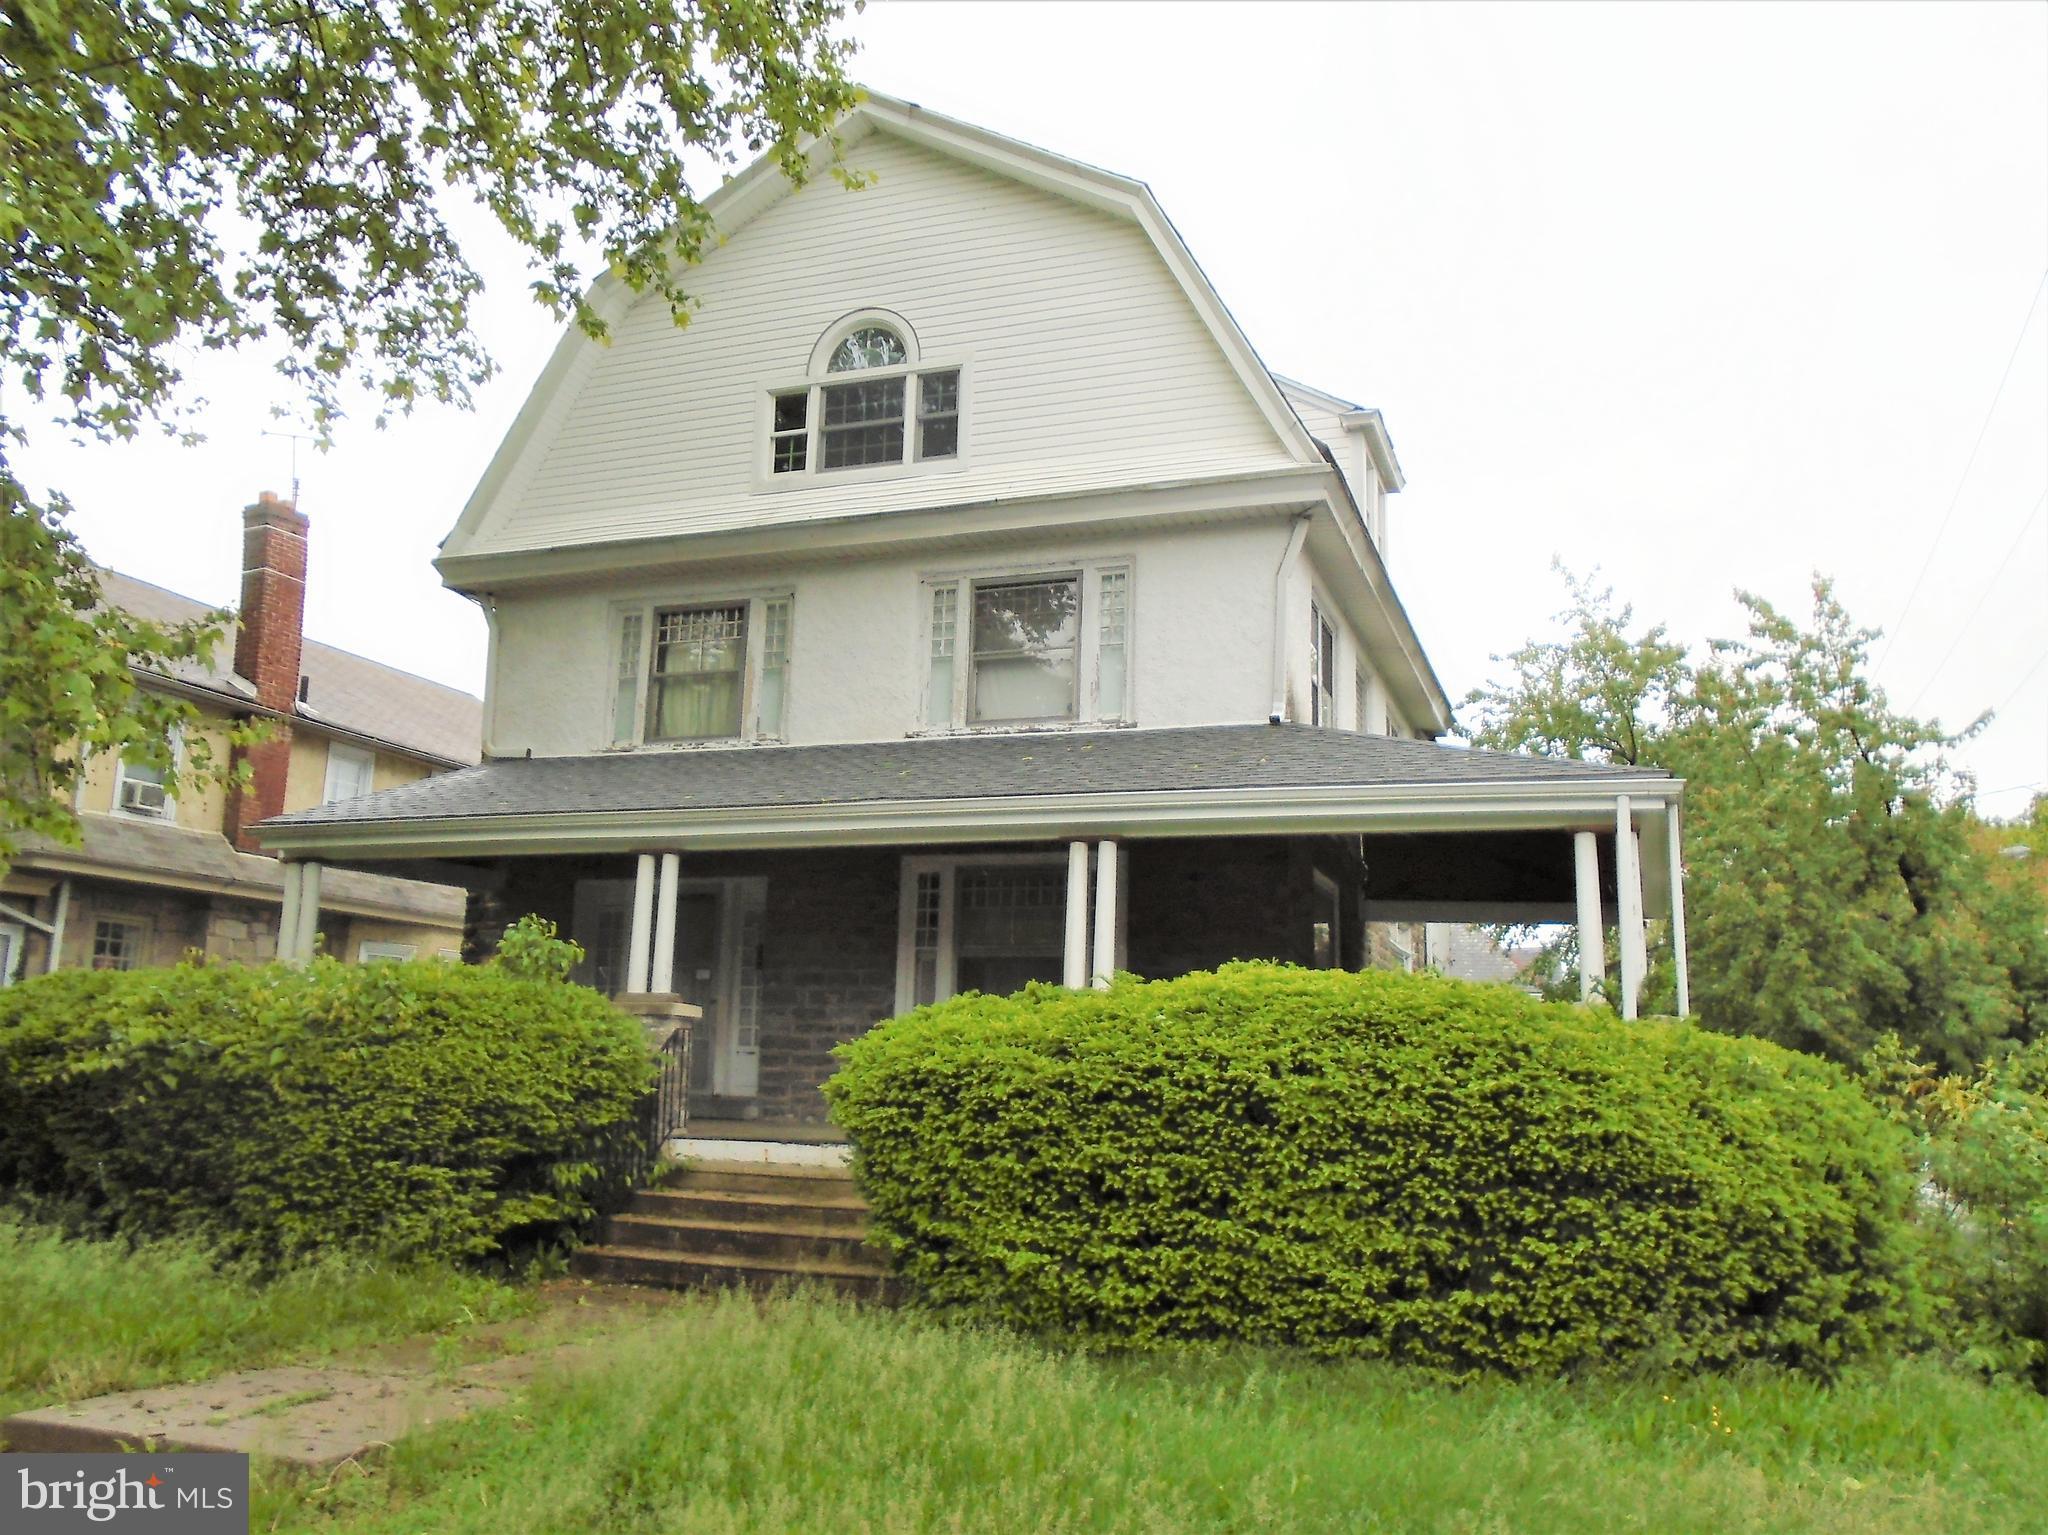 401 E 19TH STREET, CHESTER, PA 19013